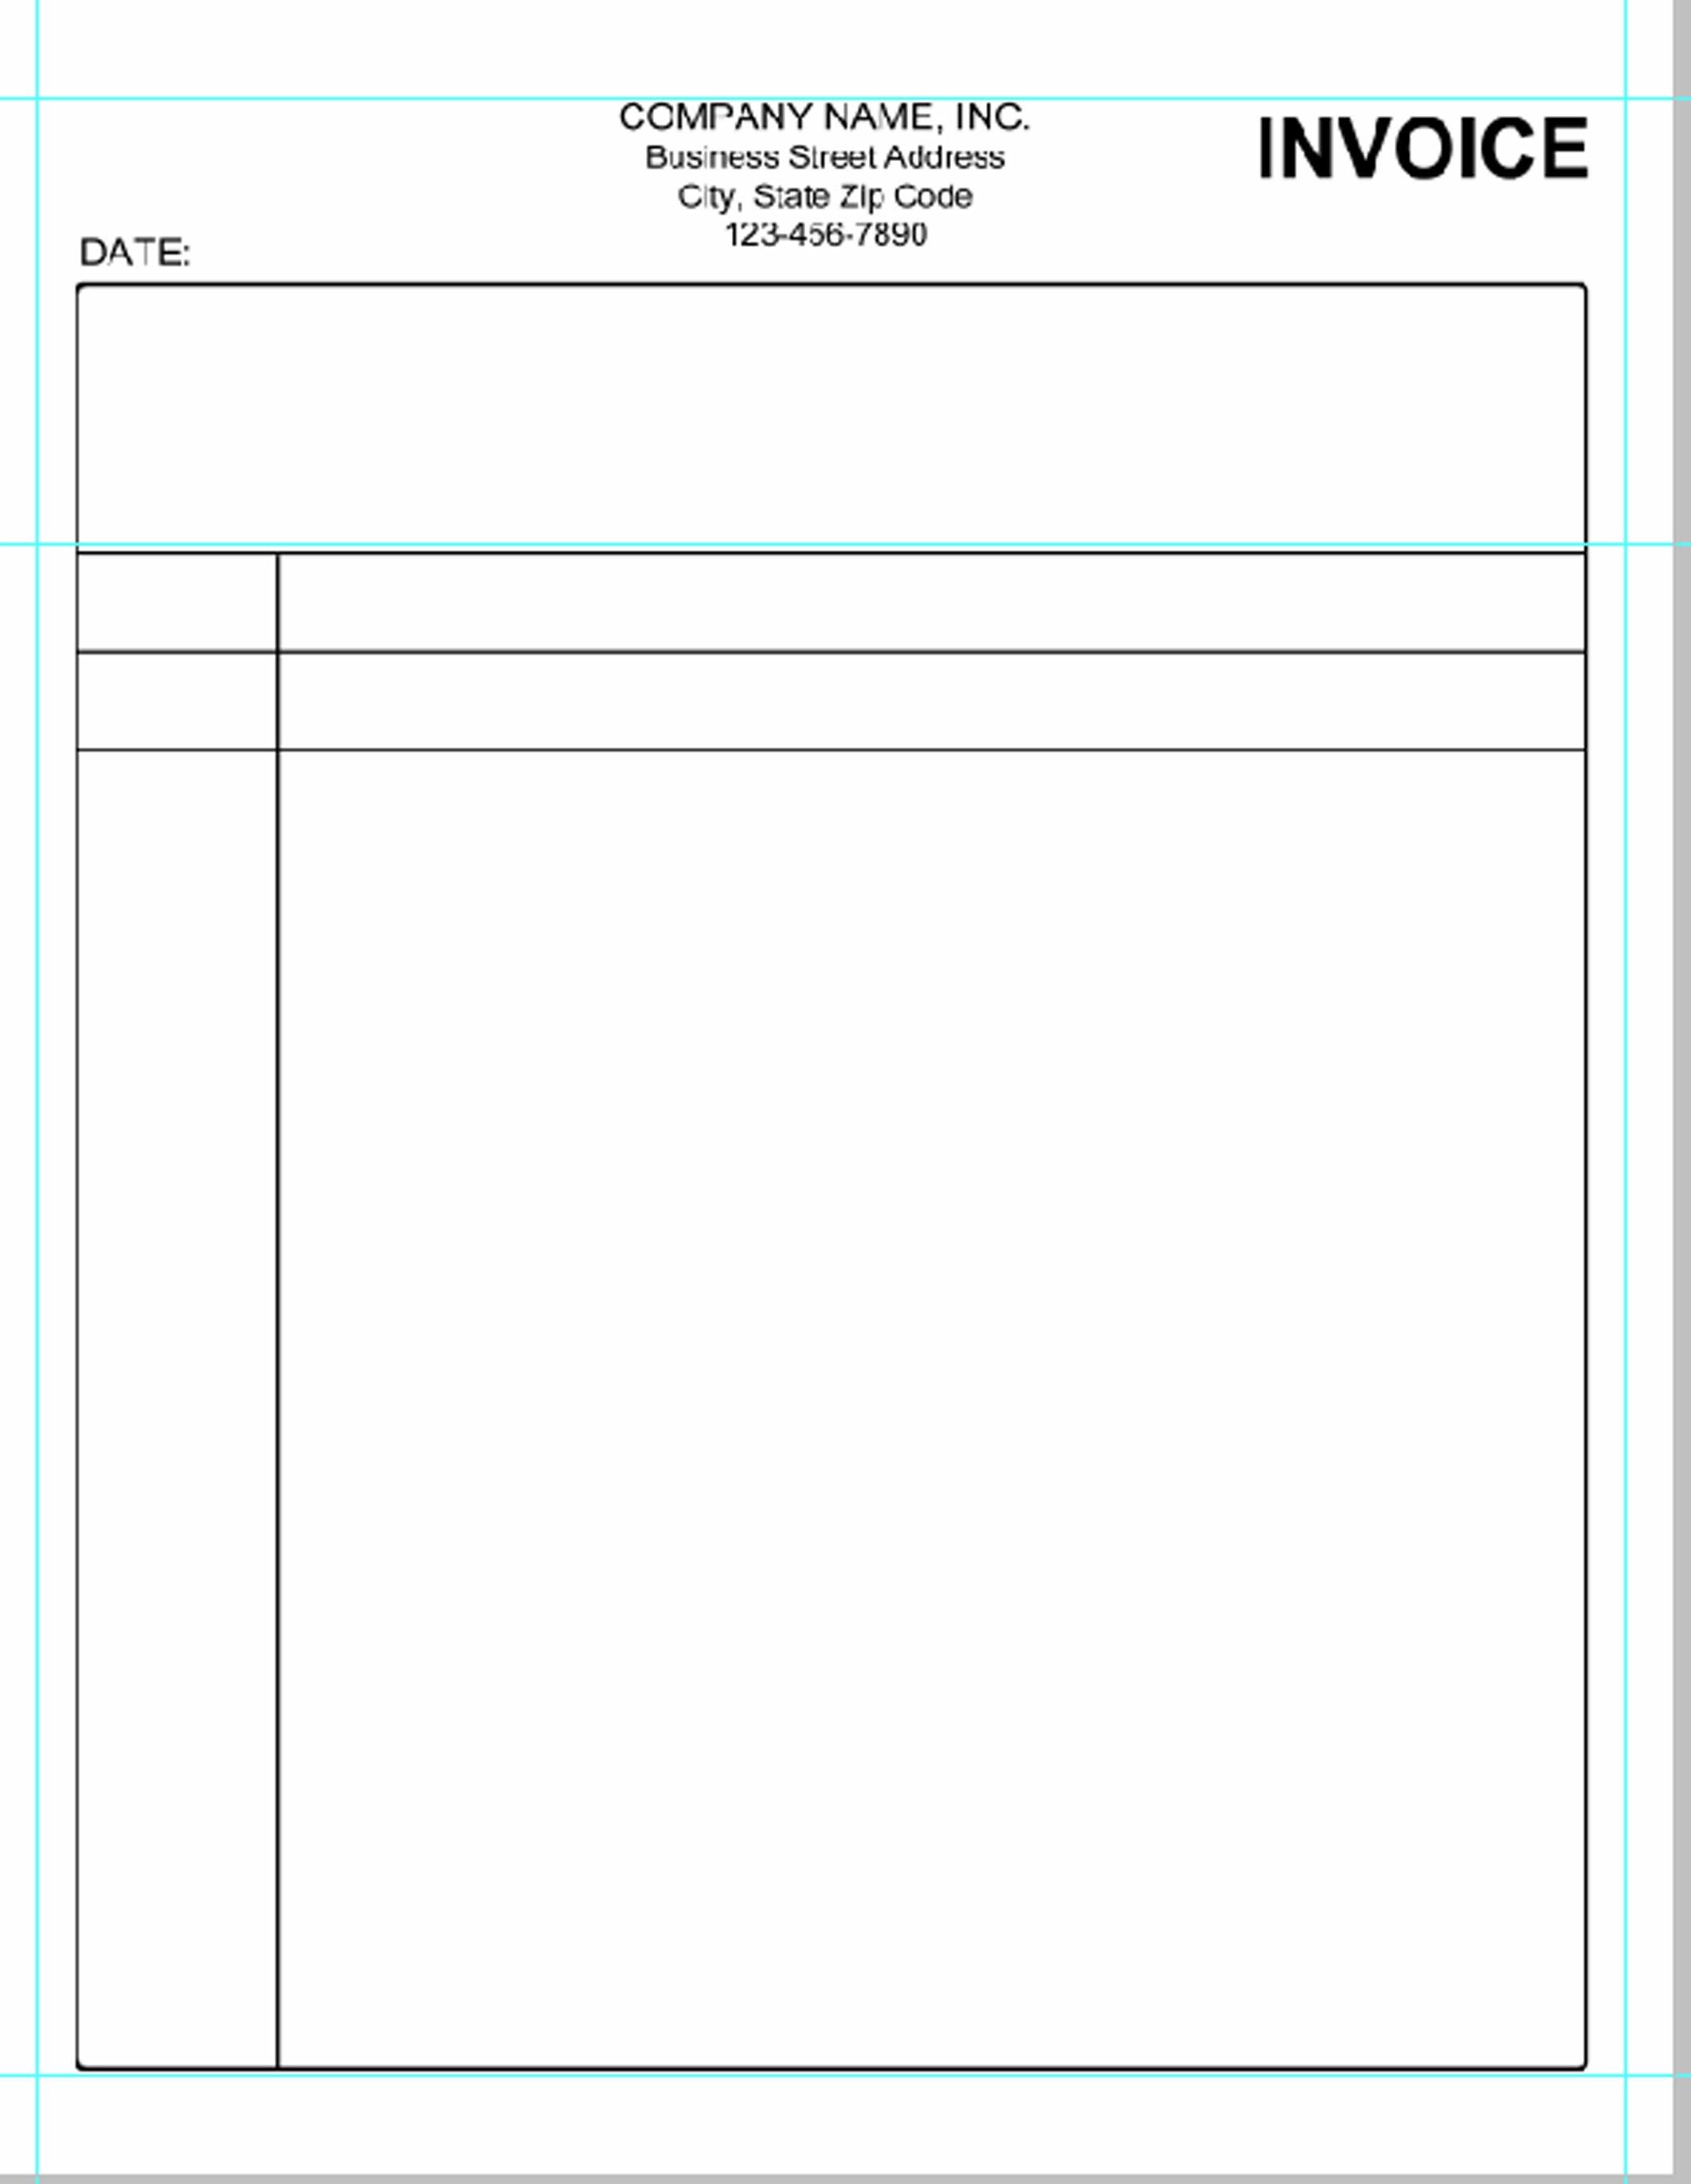 blank invoice template microsoft word invoice template free 2016 blank invoice template for microsoft word